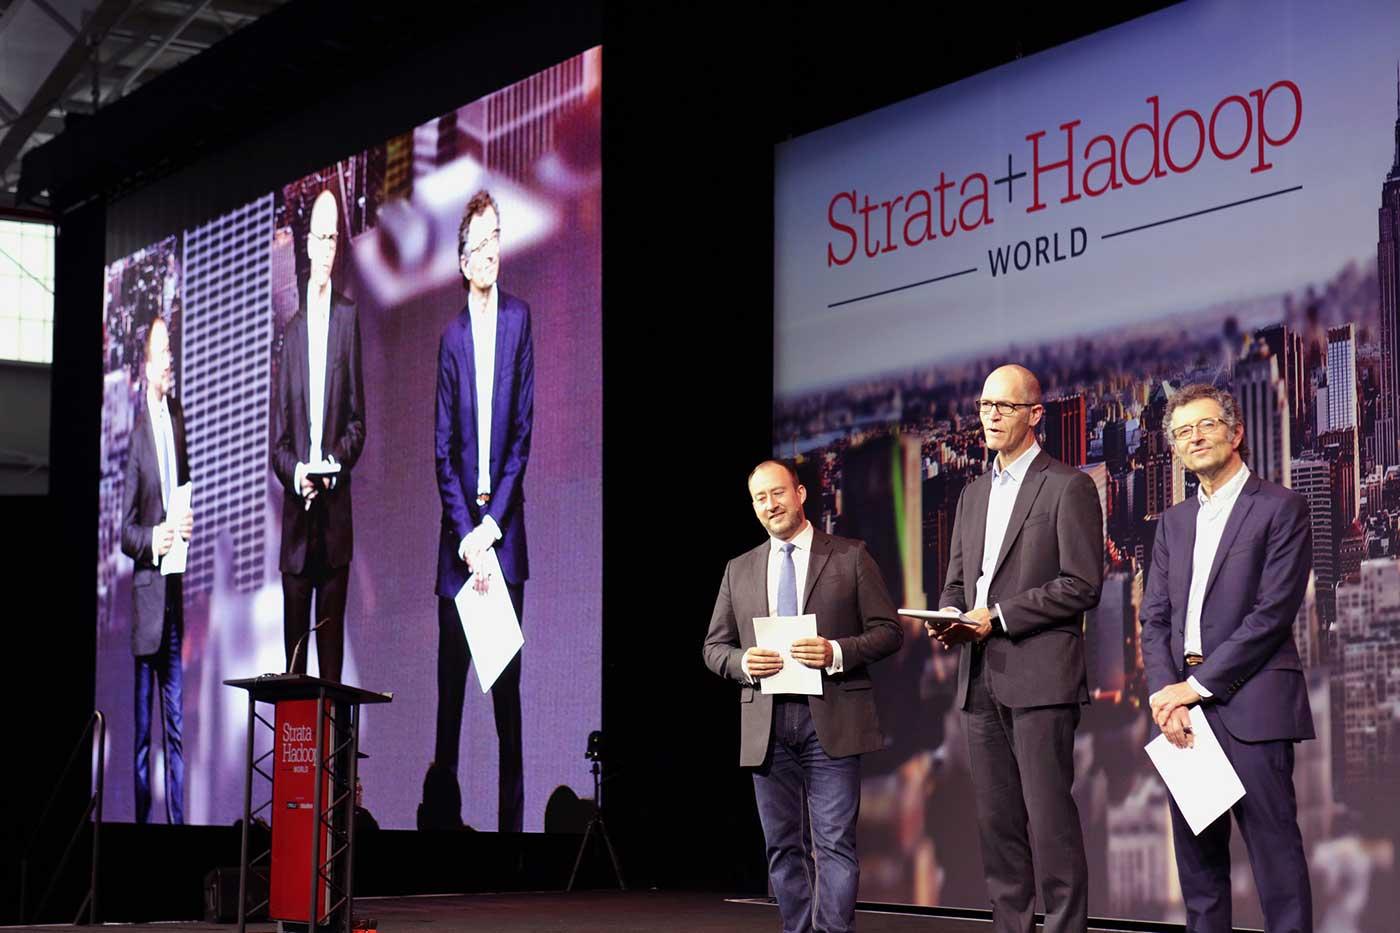 Strata + Hadoop World NY 2016 keynote stage